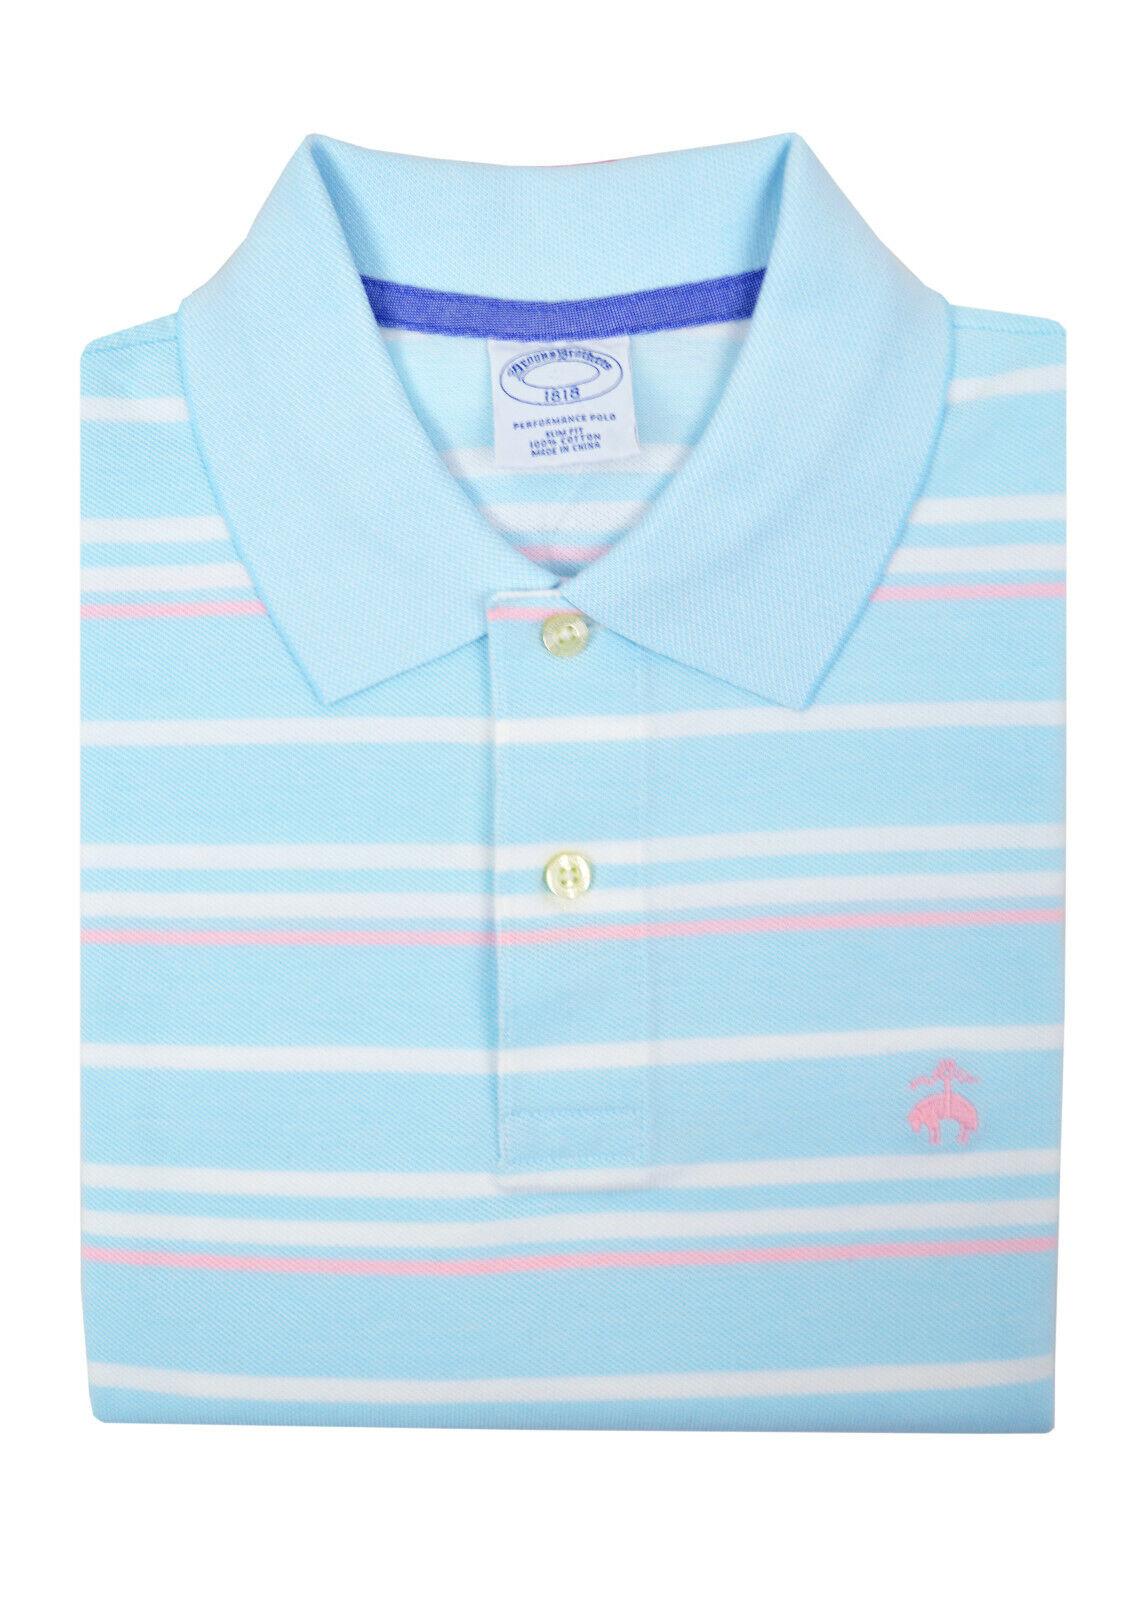 Brooks Bredhers Mens Light bluee Pink Striped Slim Fit Polo Shirt Medium M 3103-7